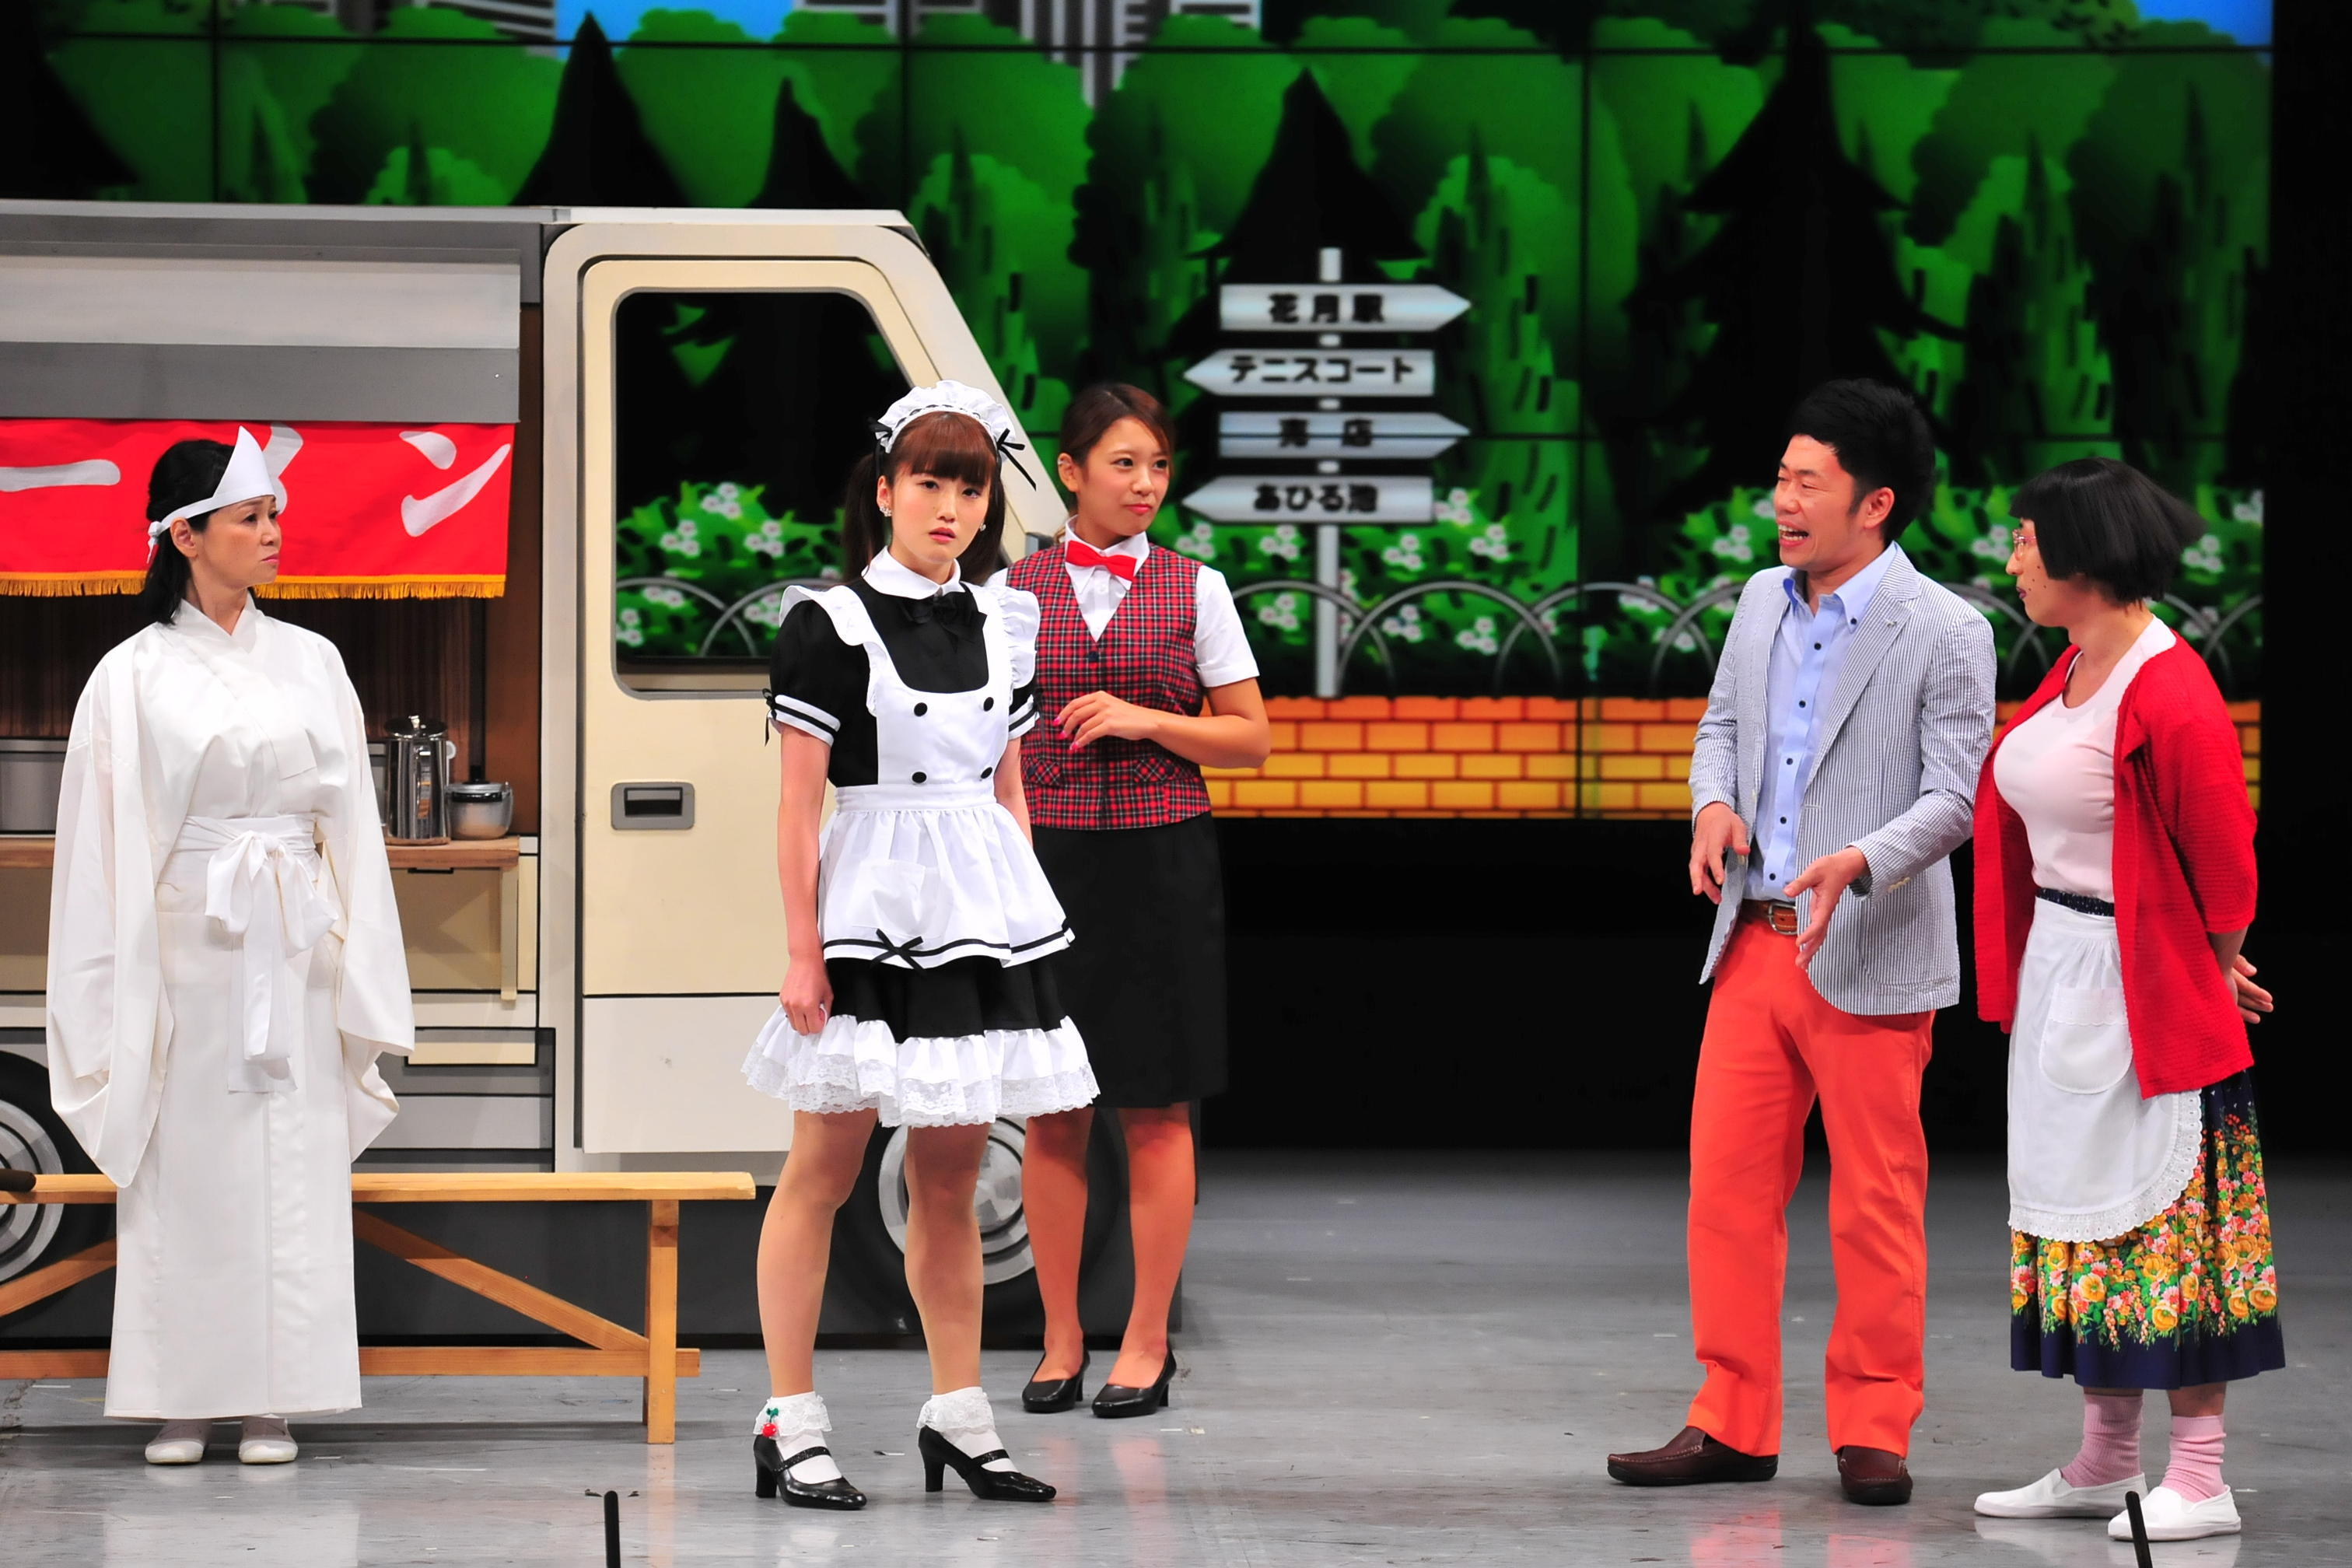 http://news.yoshimoto.co.jp/20160908201030-52074f80145ecf1d60036ada25b912eeac08cb7d.jpg